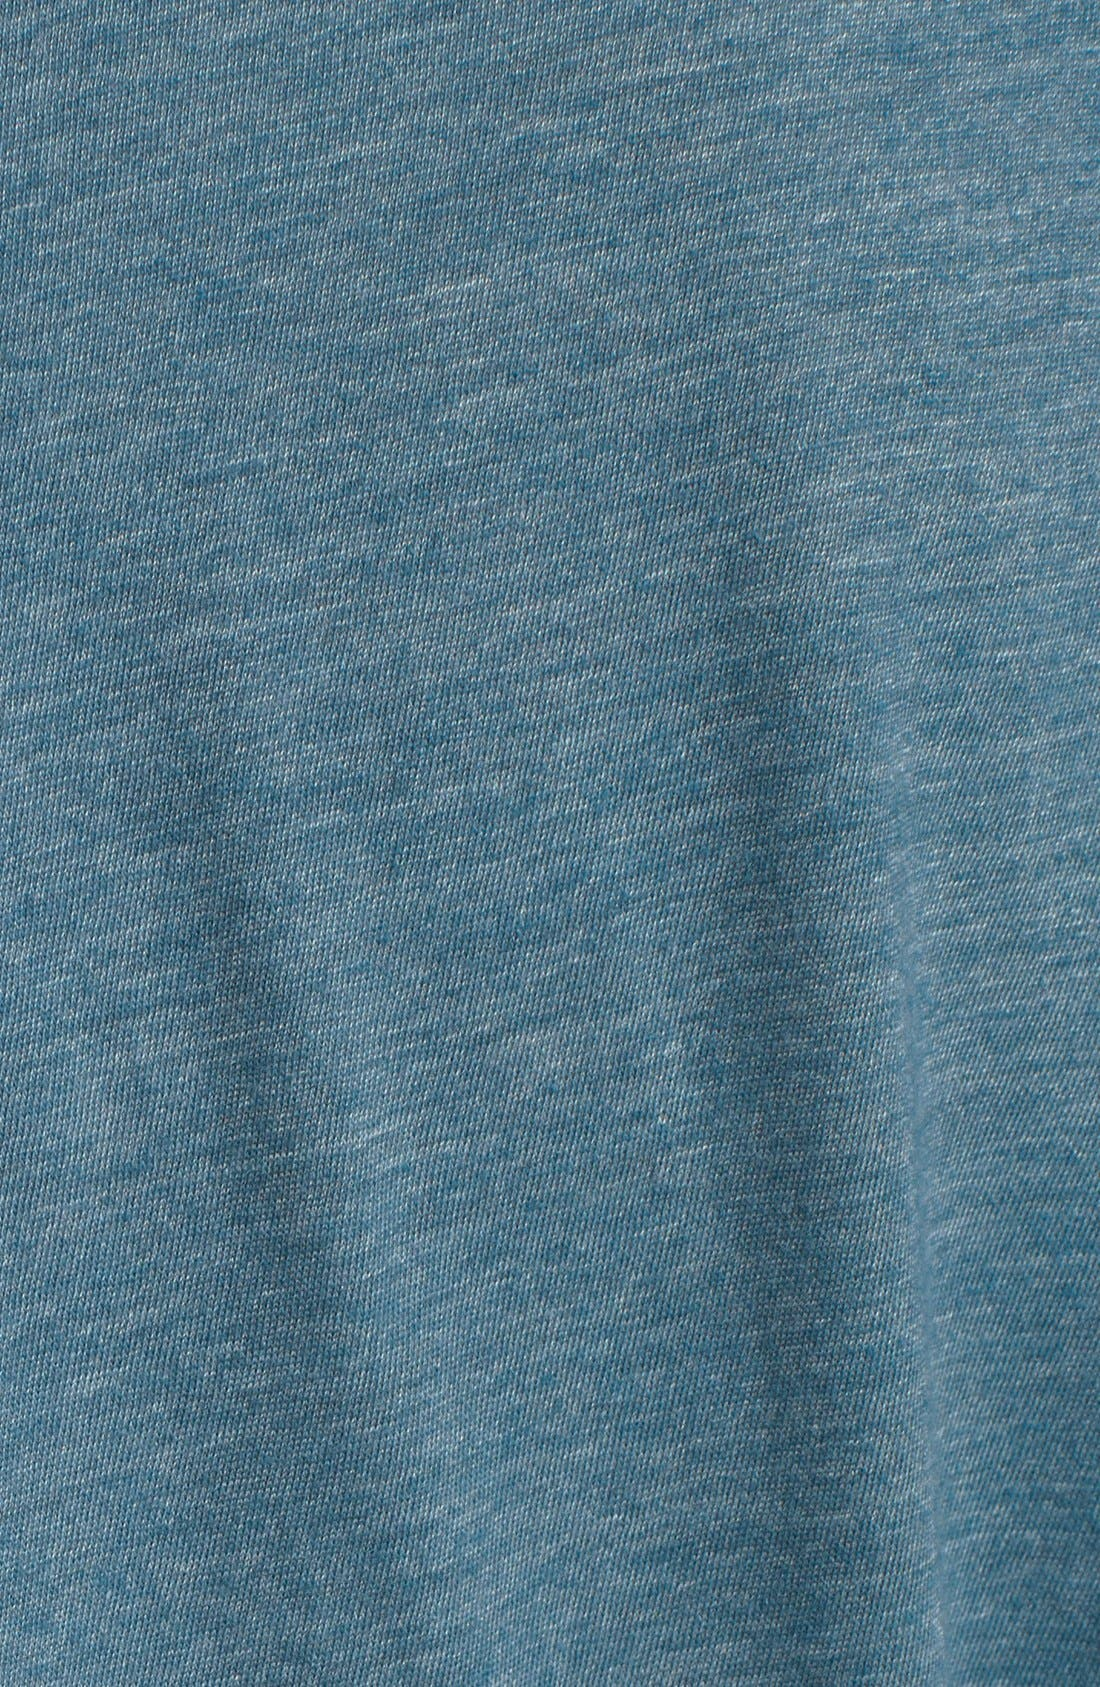 Alternate Image 3  - Stem Dolman Sleeve High/Low Tee